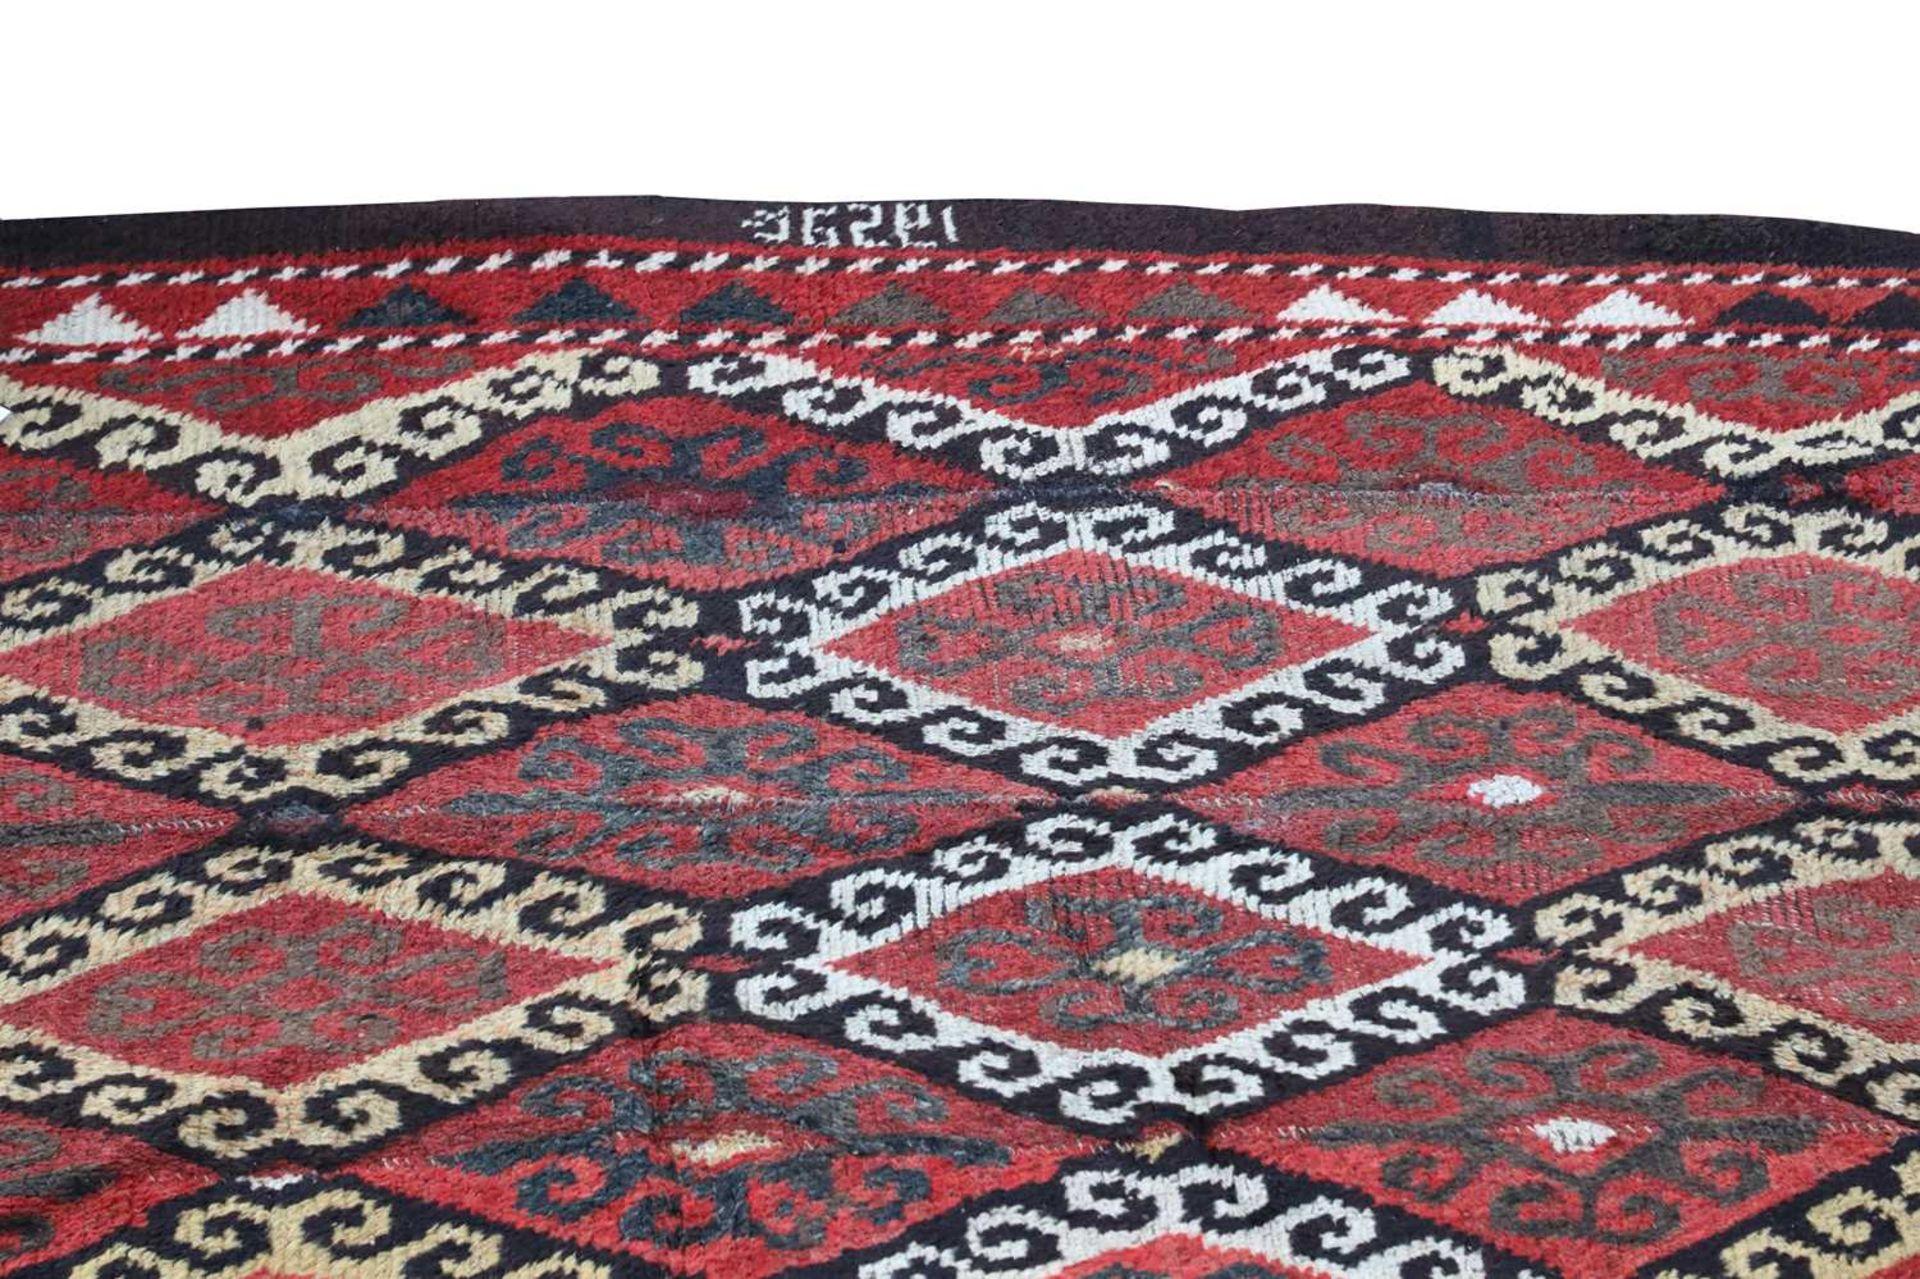 A yak wool rug, - Image 3 of 3